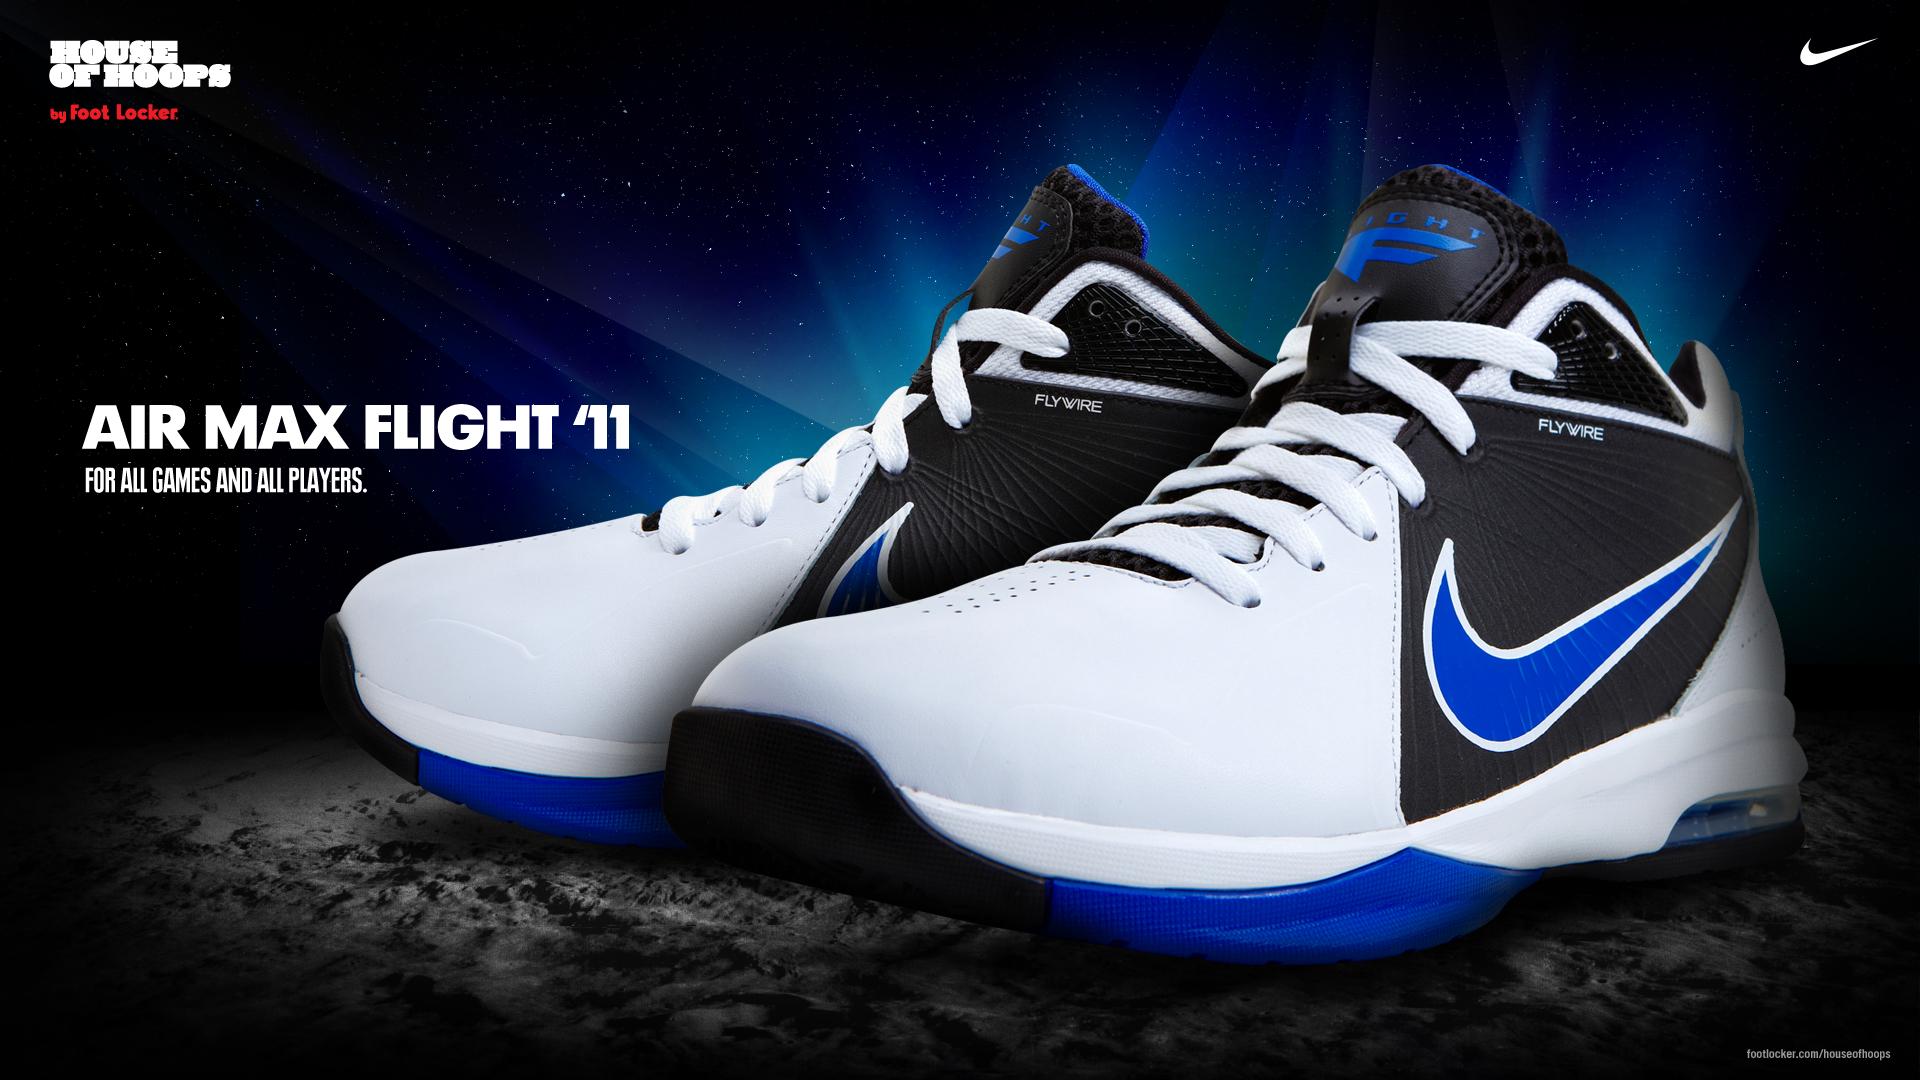 Nike Air Max Blue And White wallpaper 82613 1920x1080